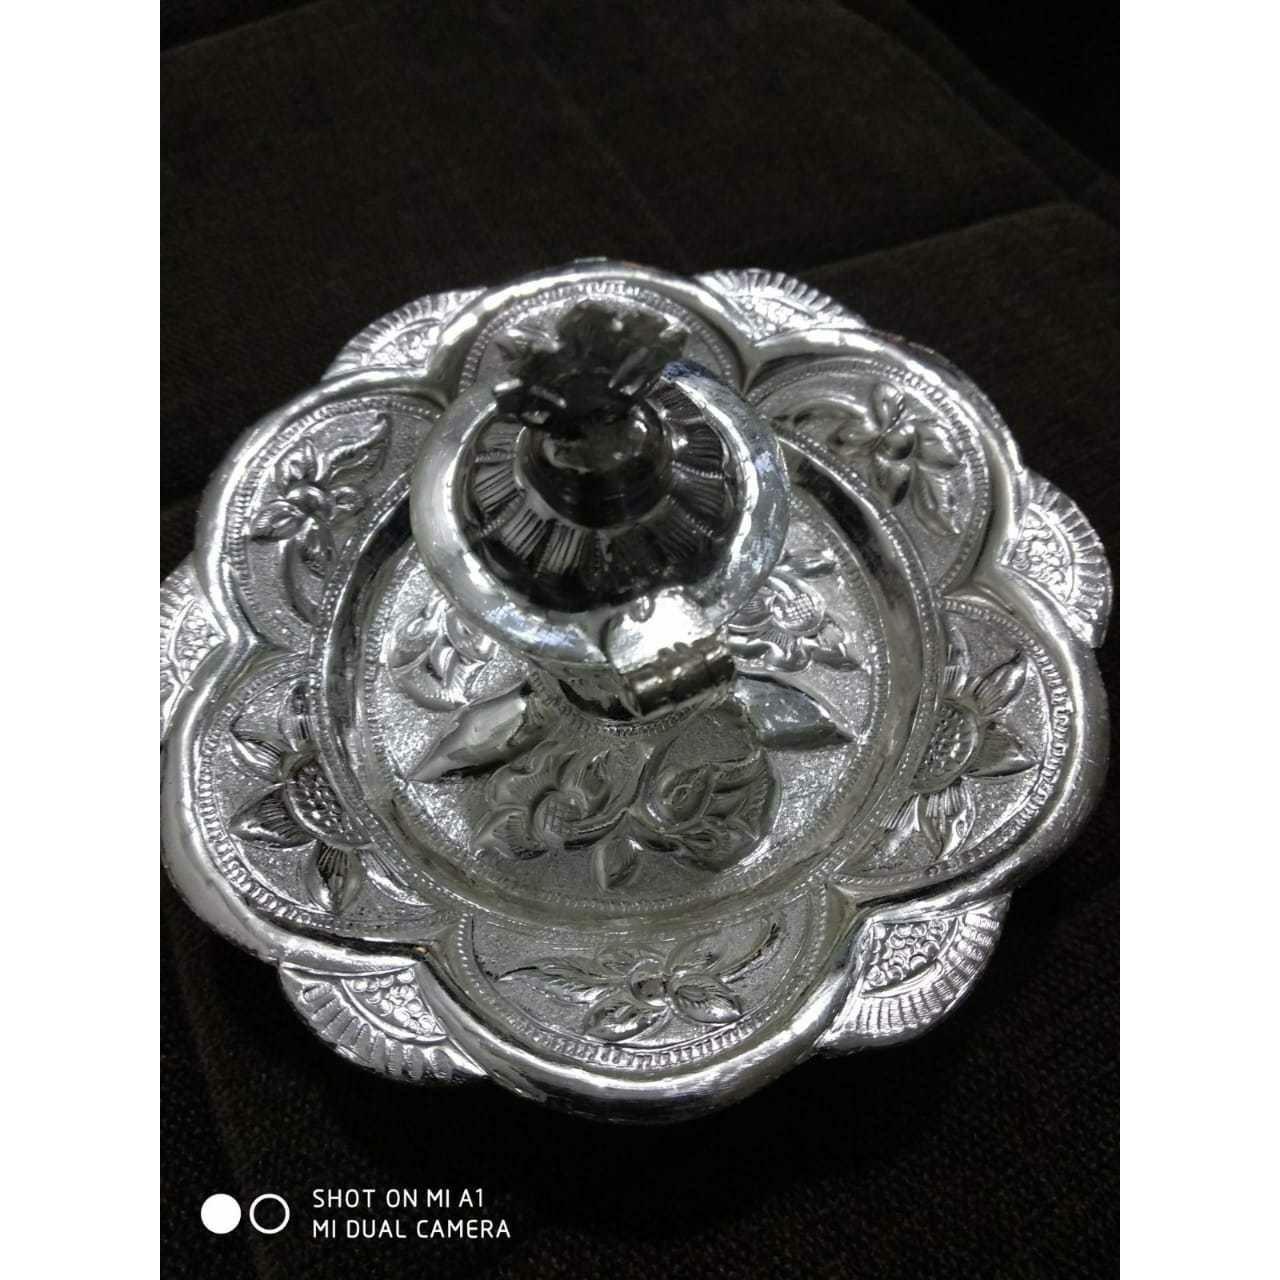 Handmade Cholel Nakshi Medium Weight Kankavati Ms-2619